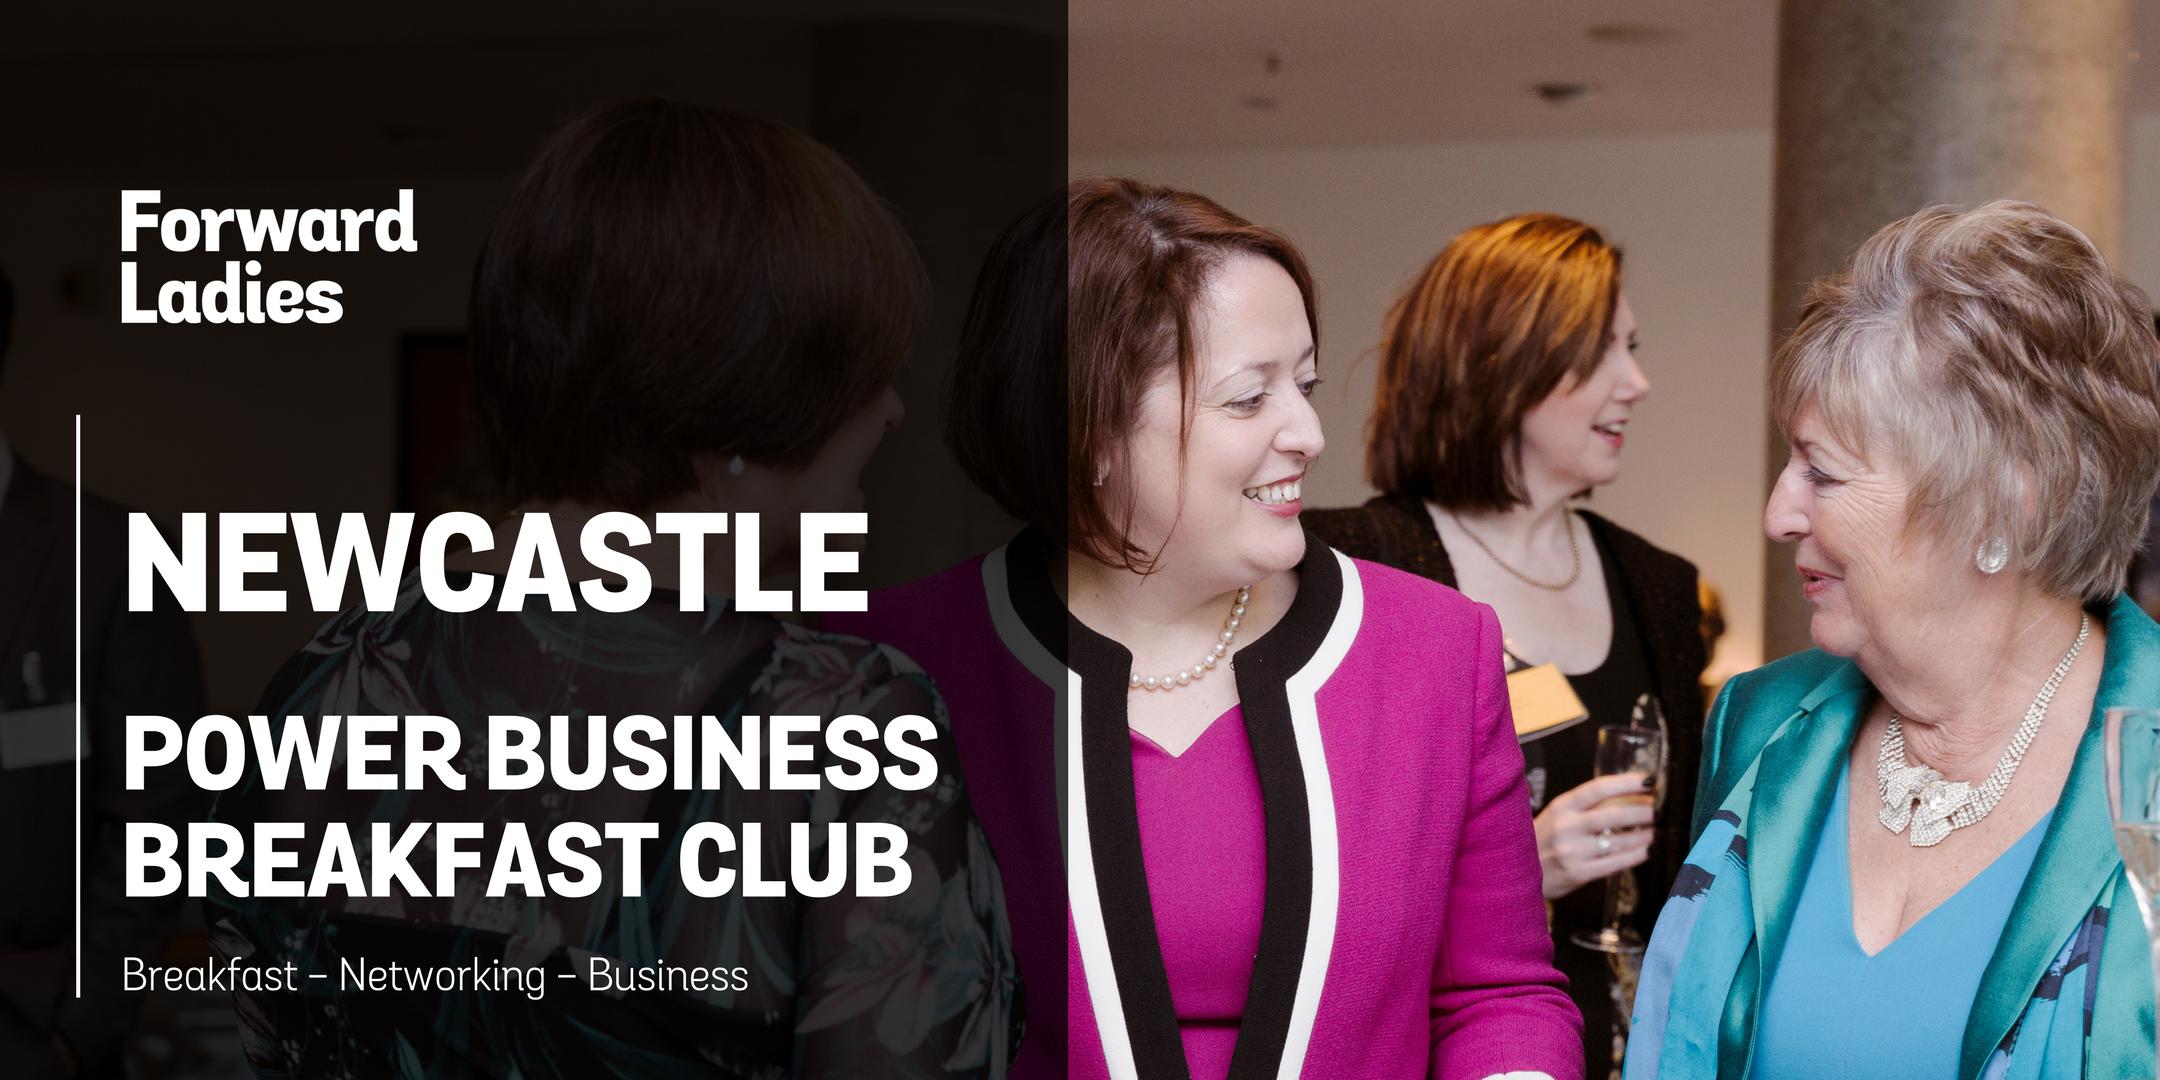 Newcastle Power Business Breakfast Club – December